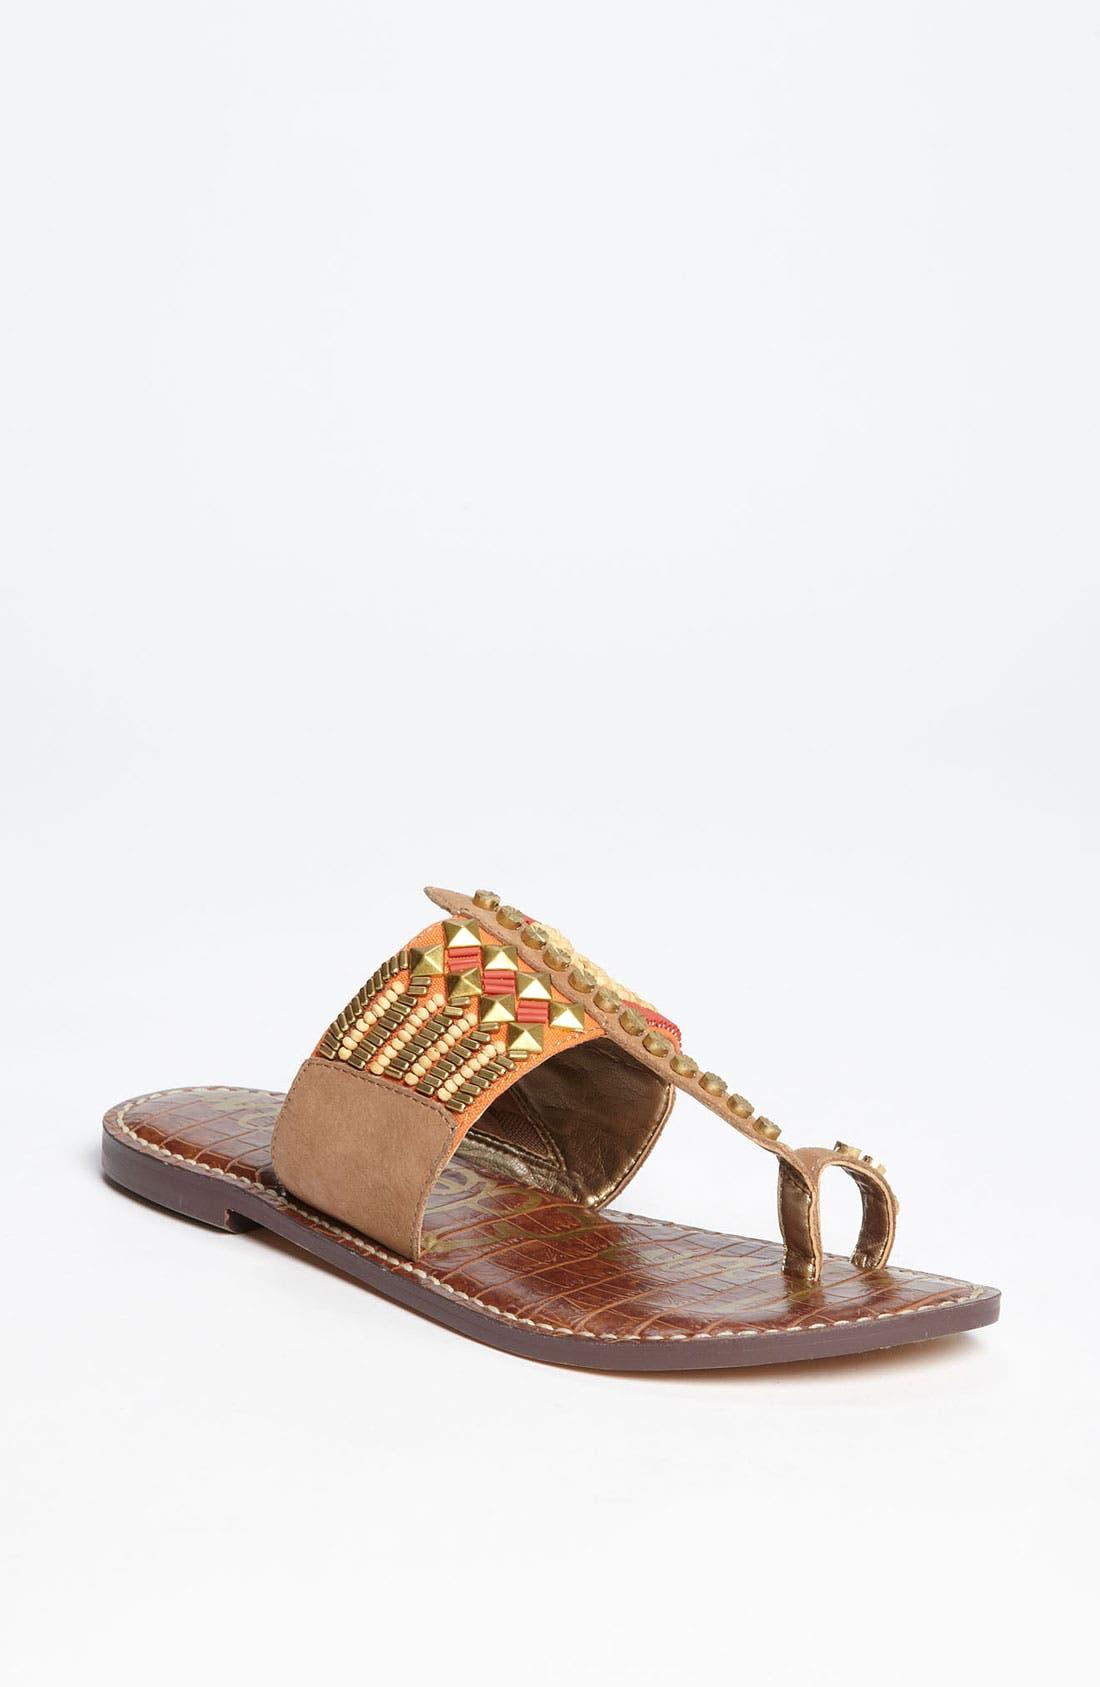 Main Image - Sam Edelman 'Gideon' Sandal